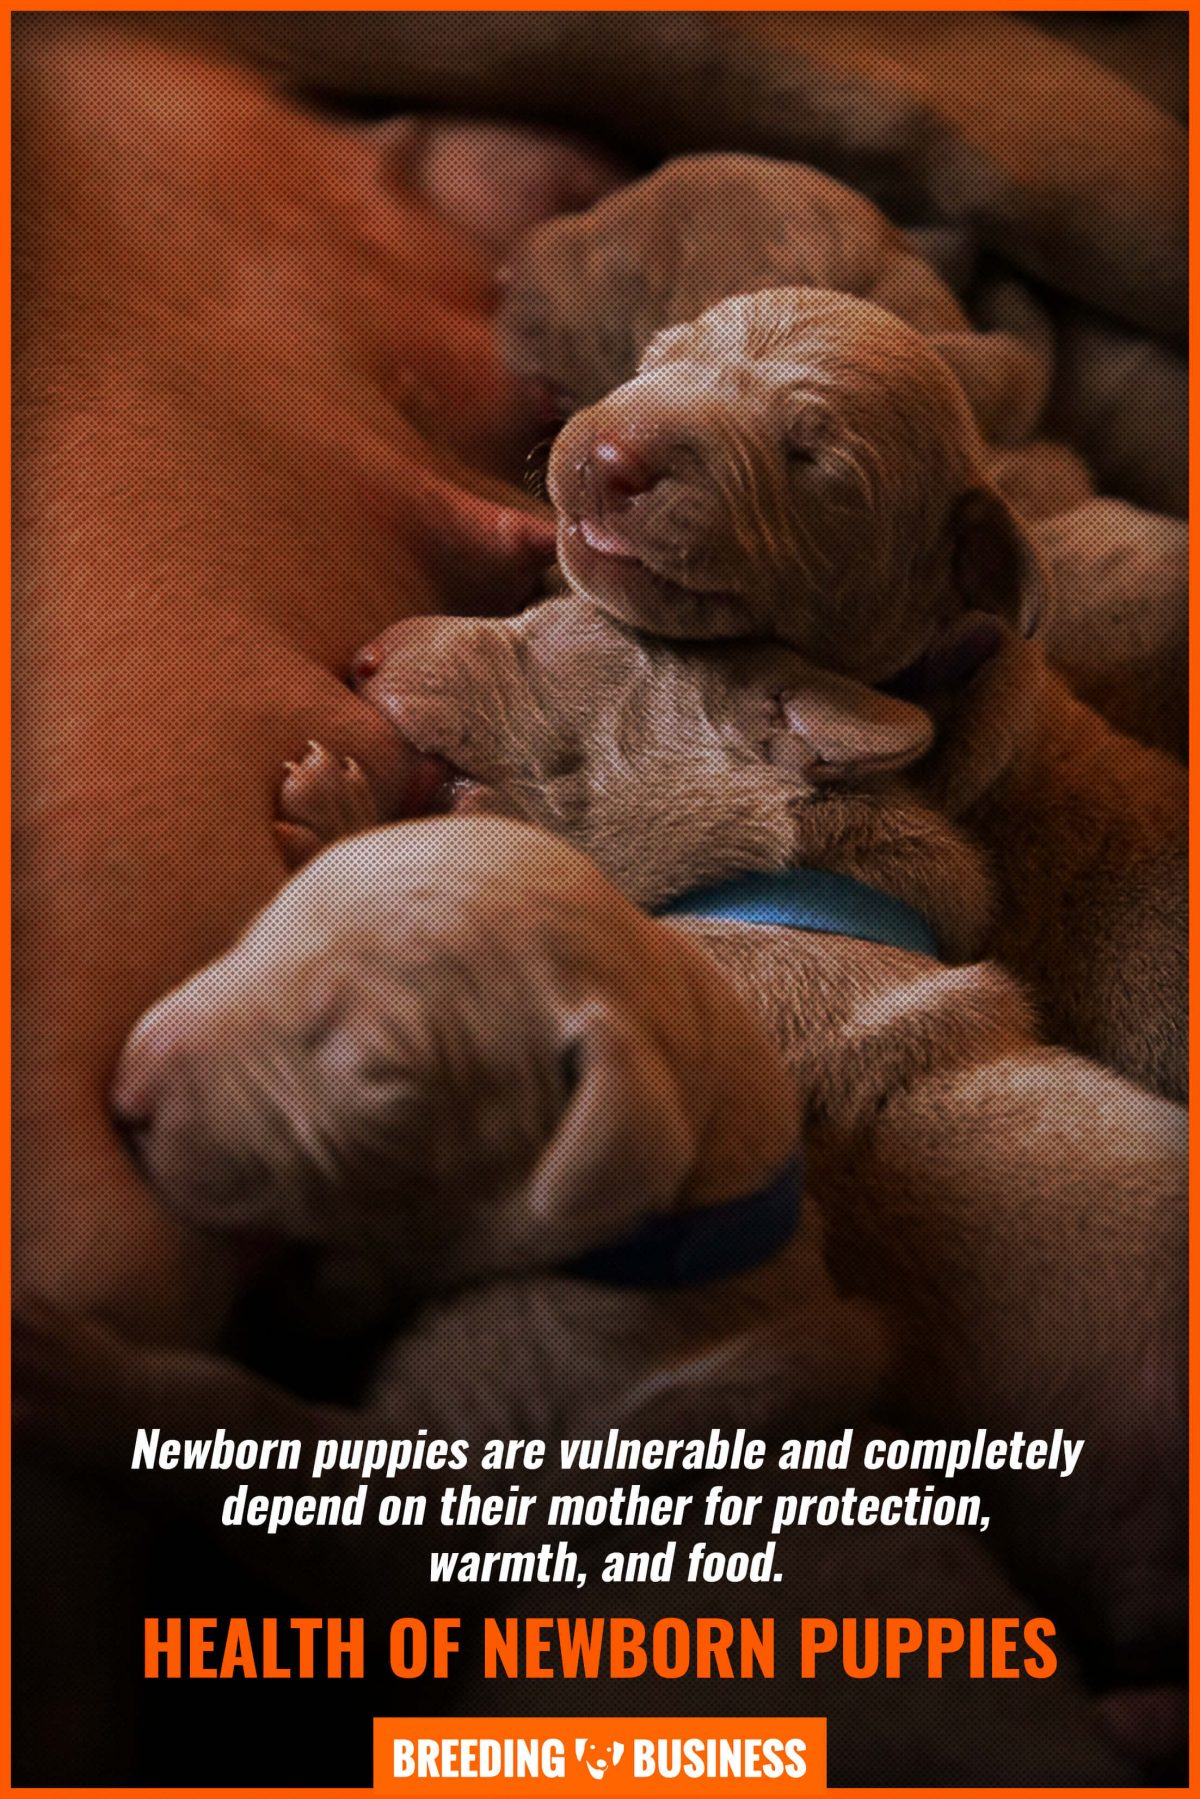 health of newborn puppies